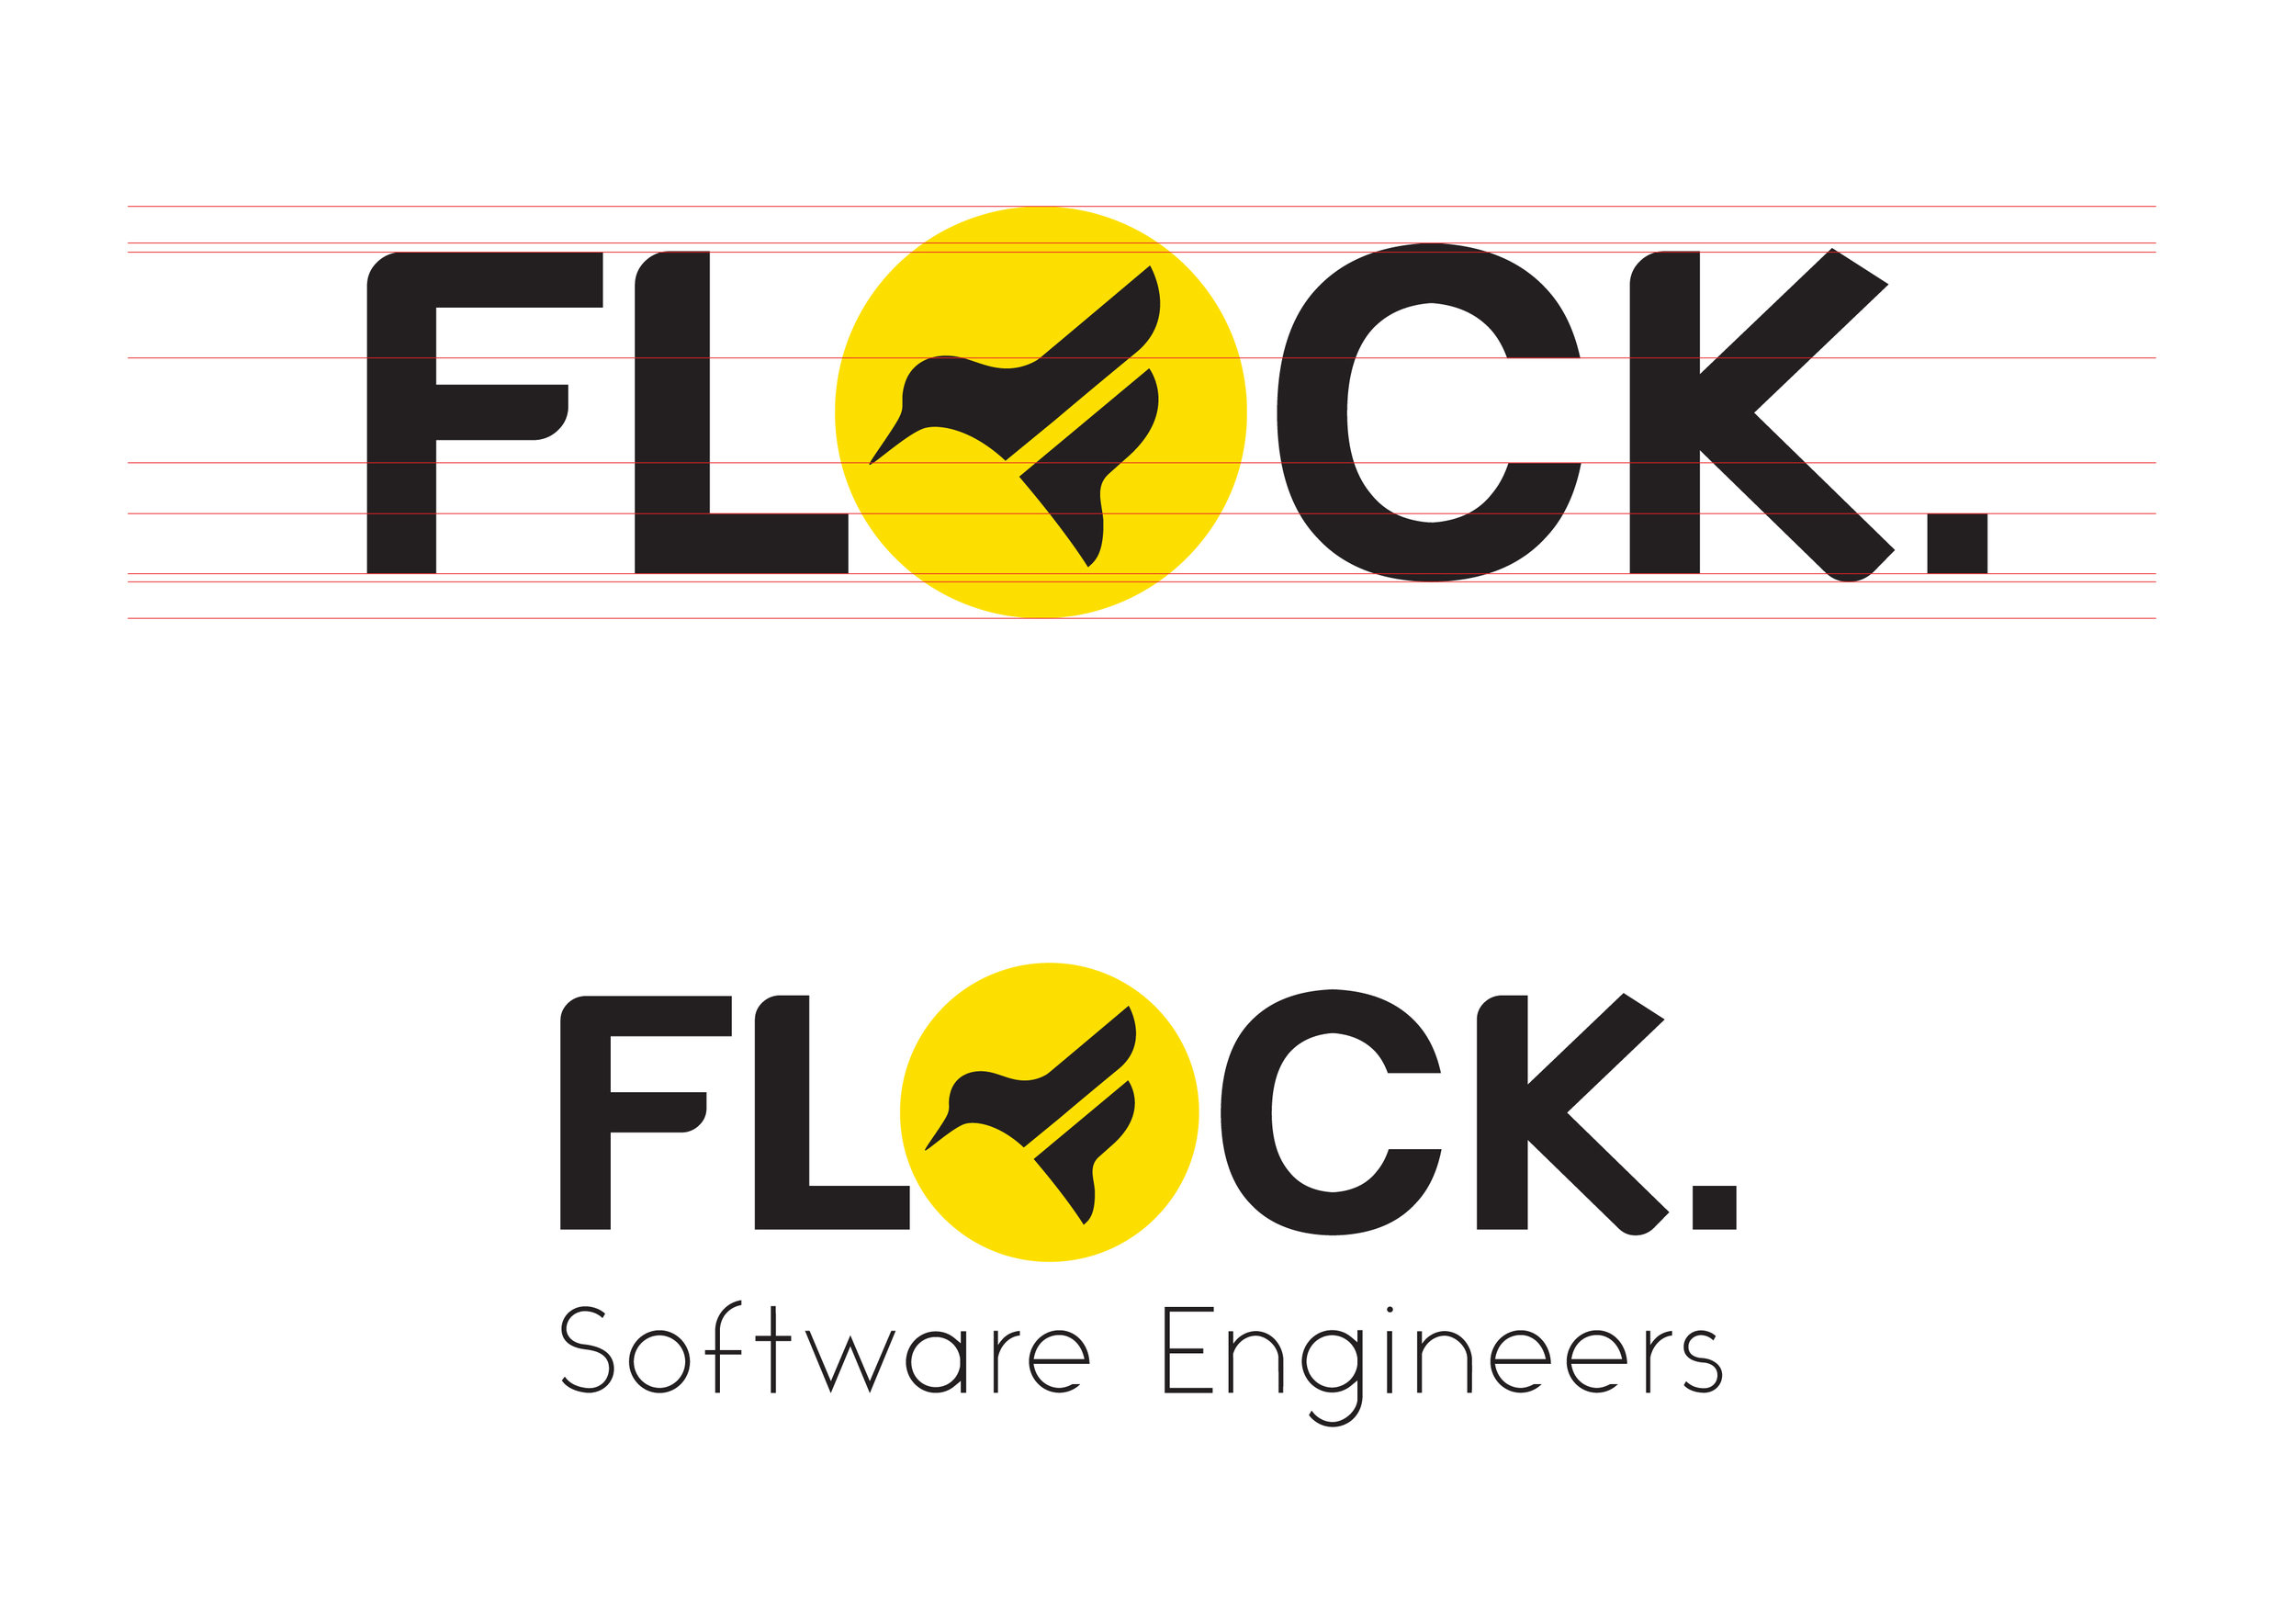 Flock_logo_final-08.jpg